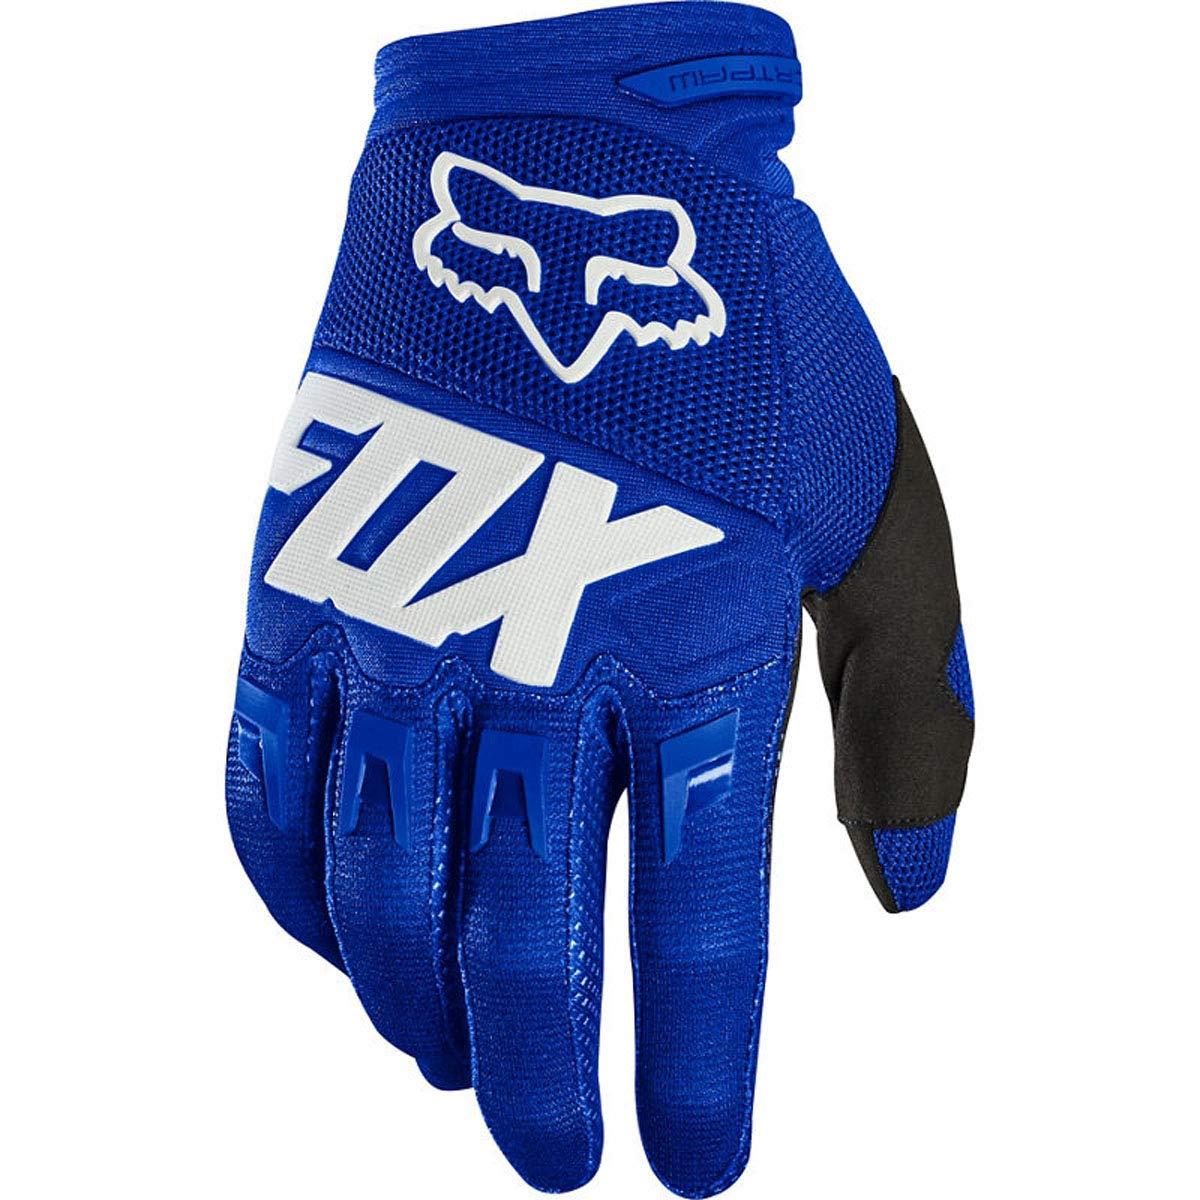 Race Grey Fox Dirtpaw Glove